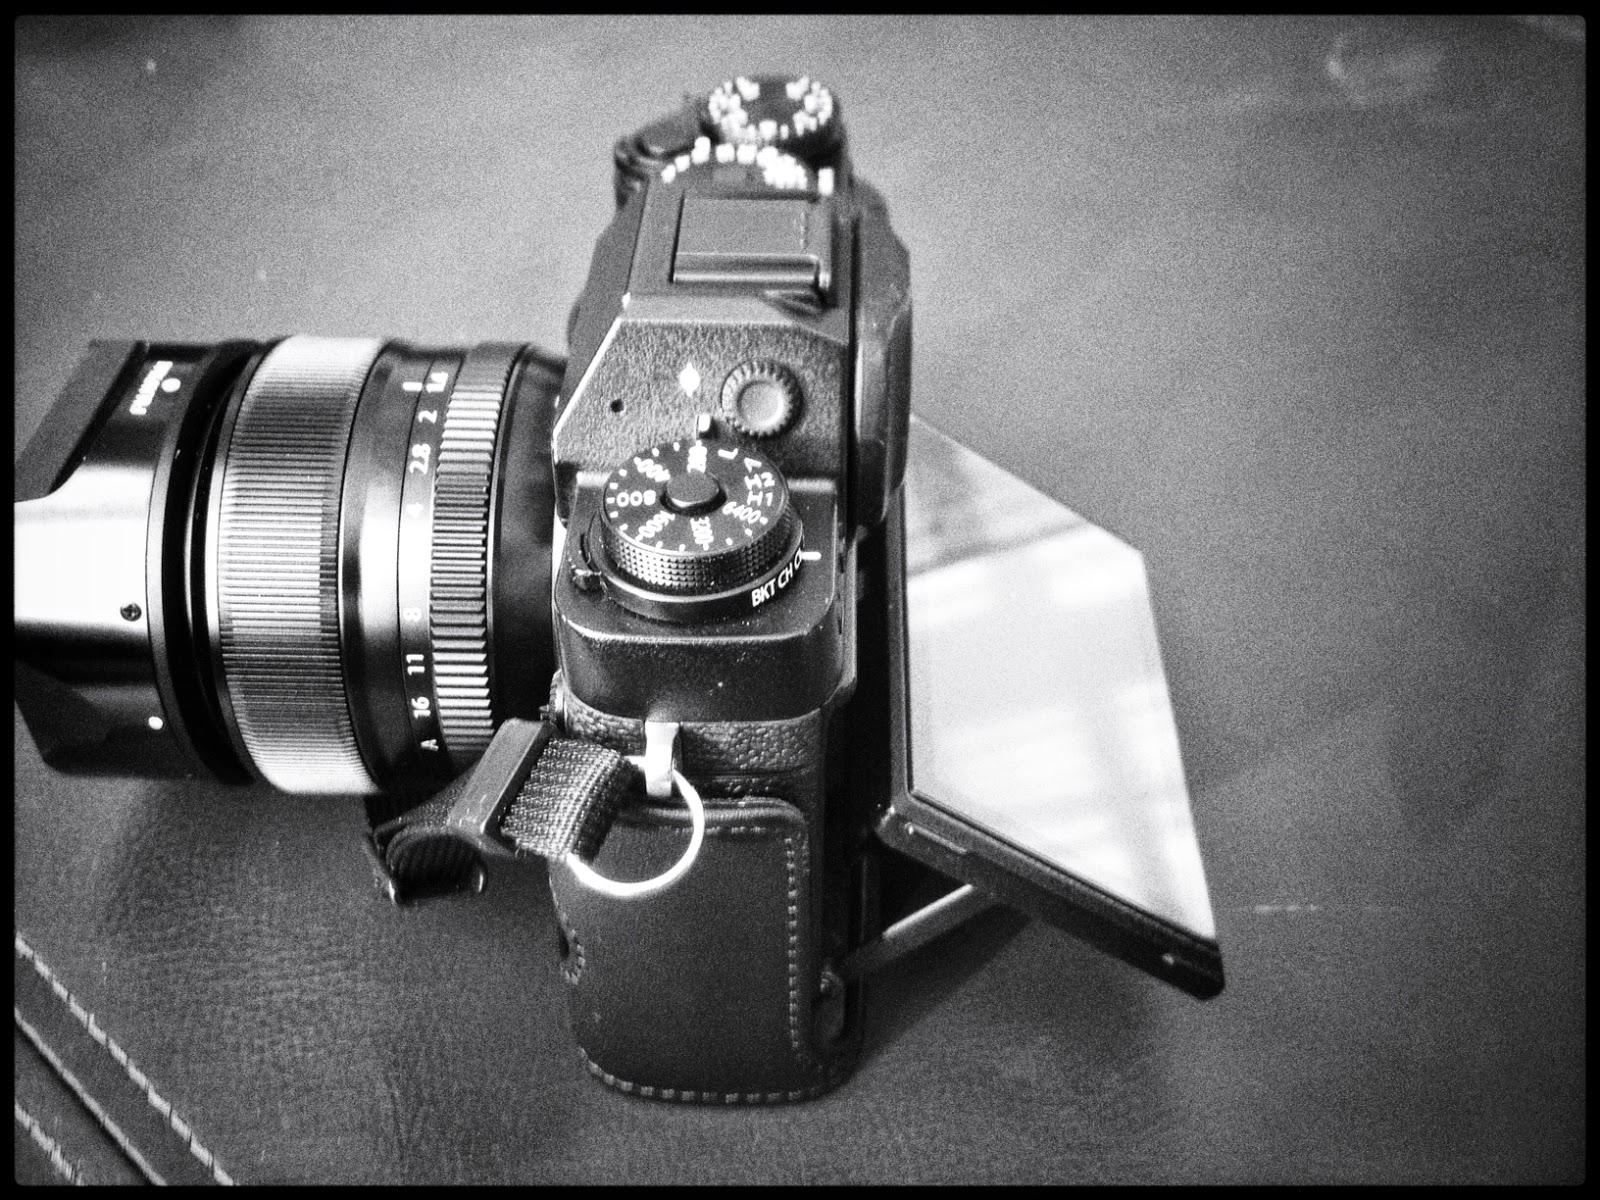 FujiXT1comparisontiltscreencameramirrorlessupstrap35mmf,1.4lightweightelectronic shutter